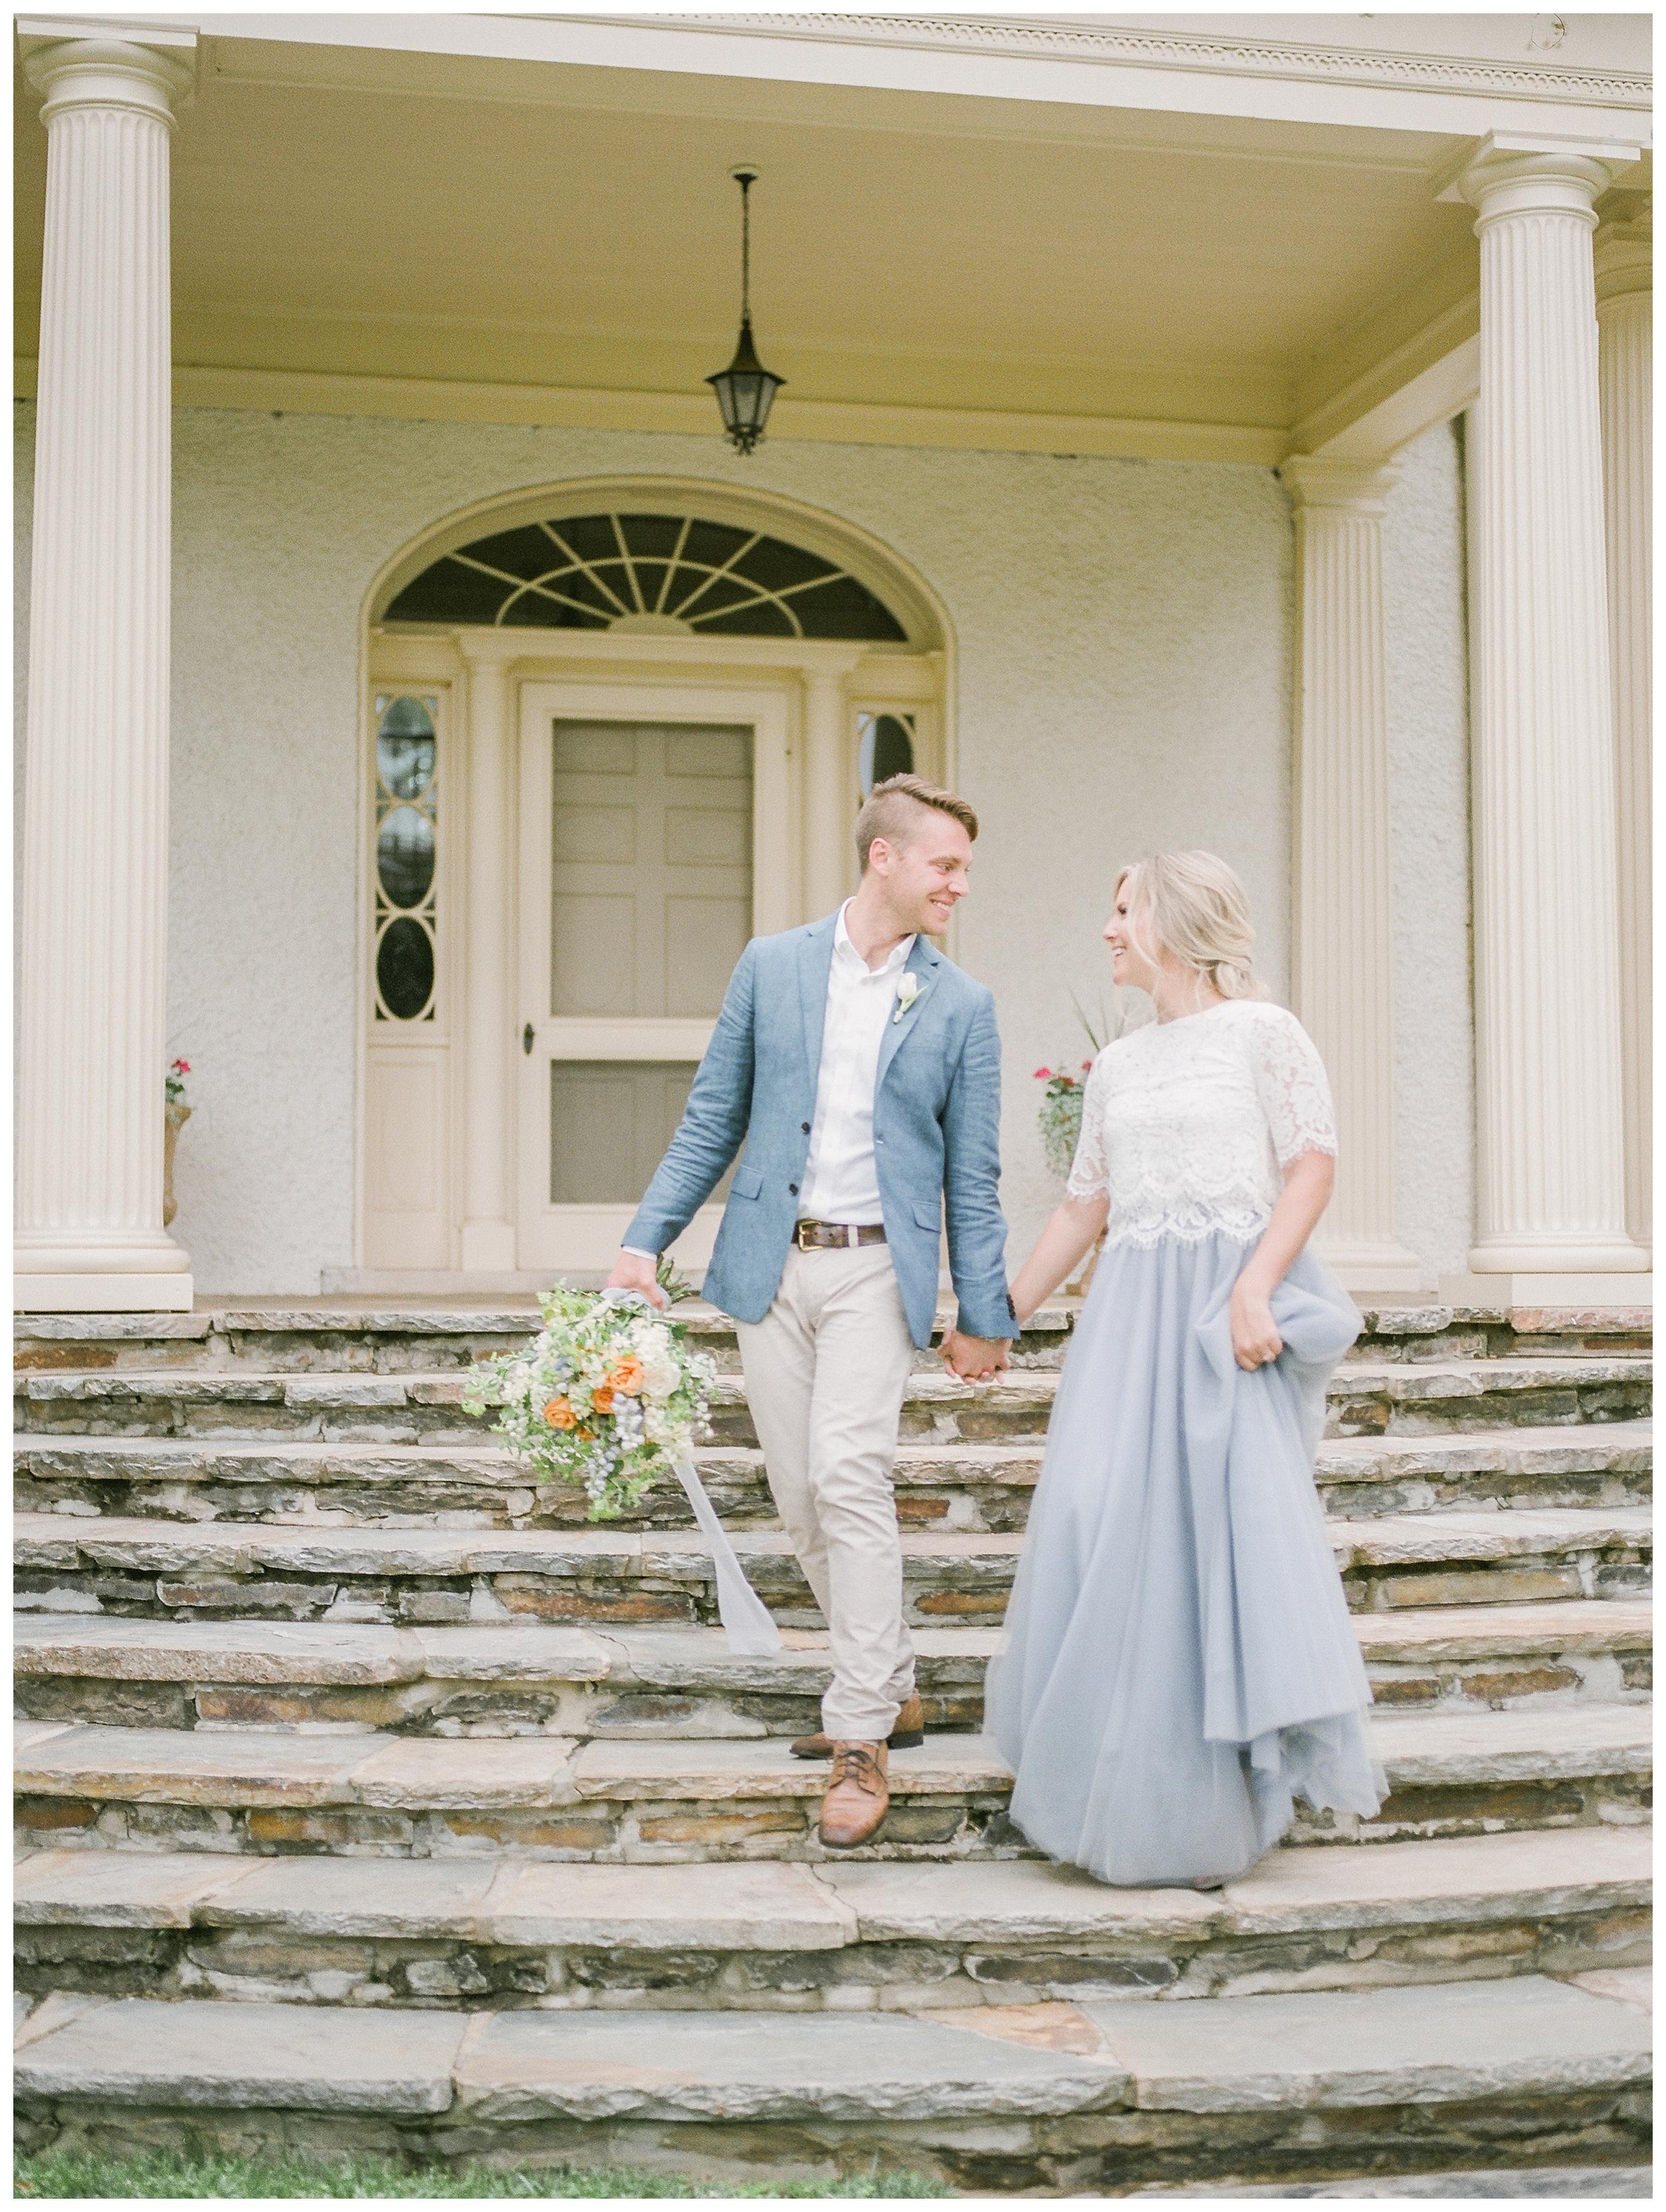 Rust Manor Wedding   Virginia Wedding Photographer Kir Tuben_0009.jpg